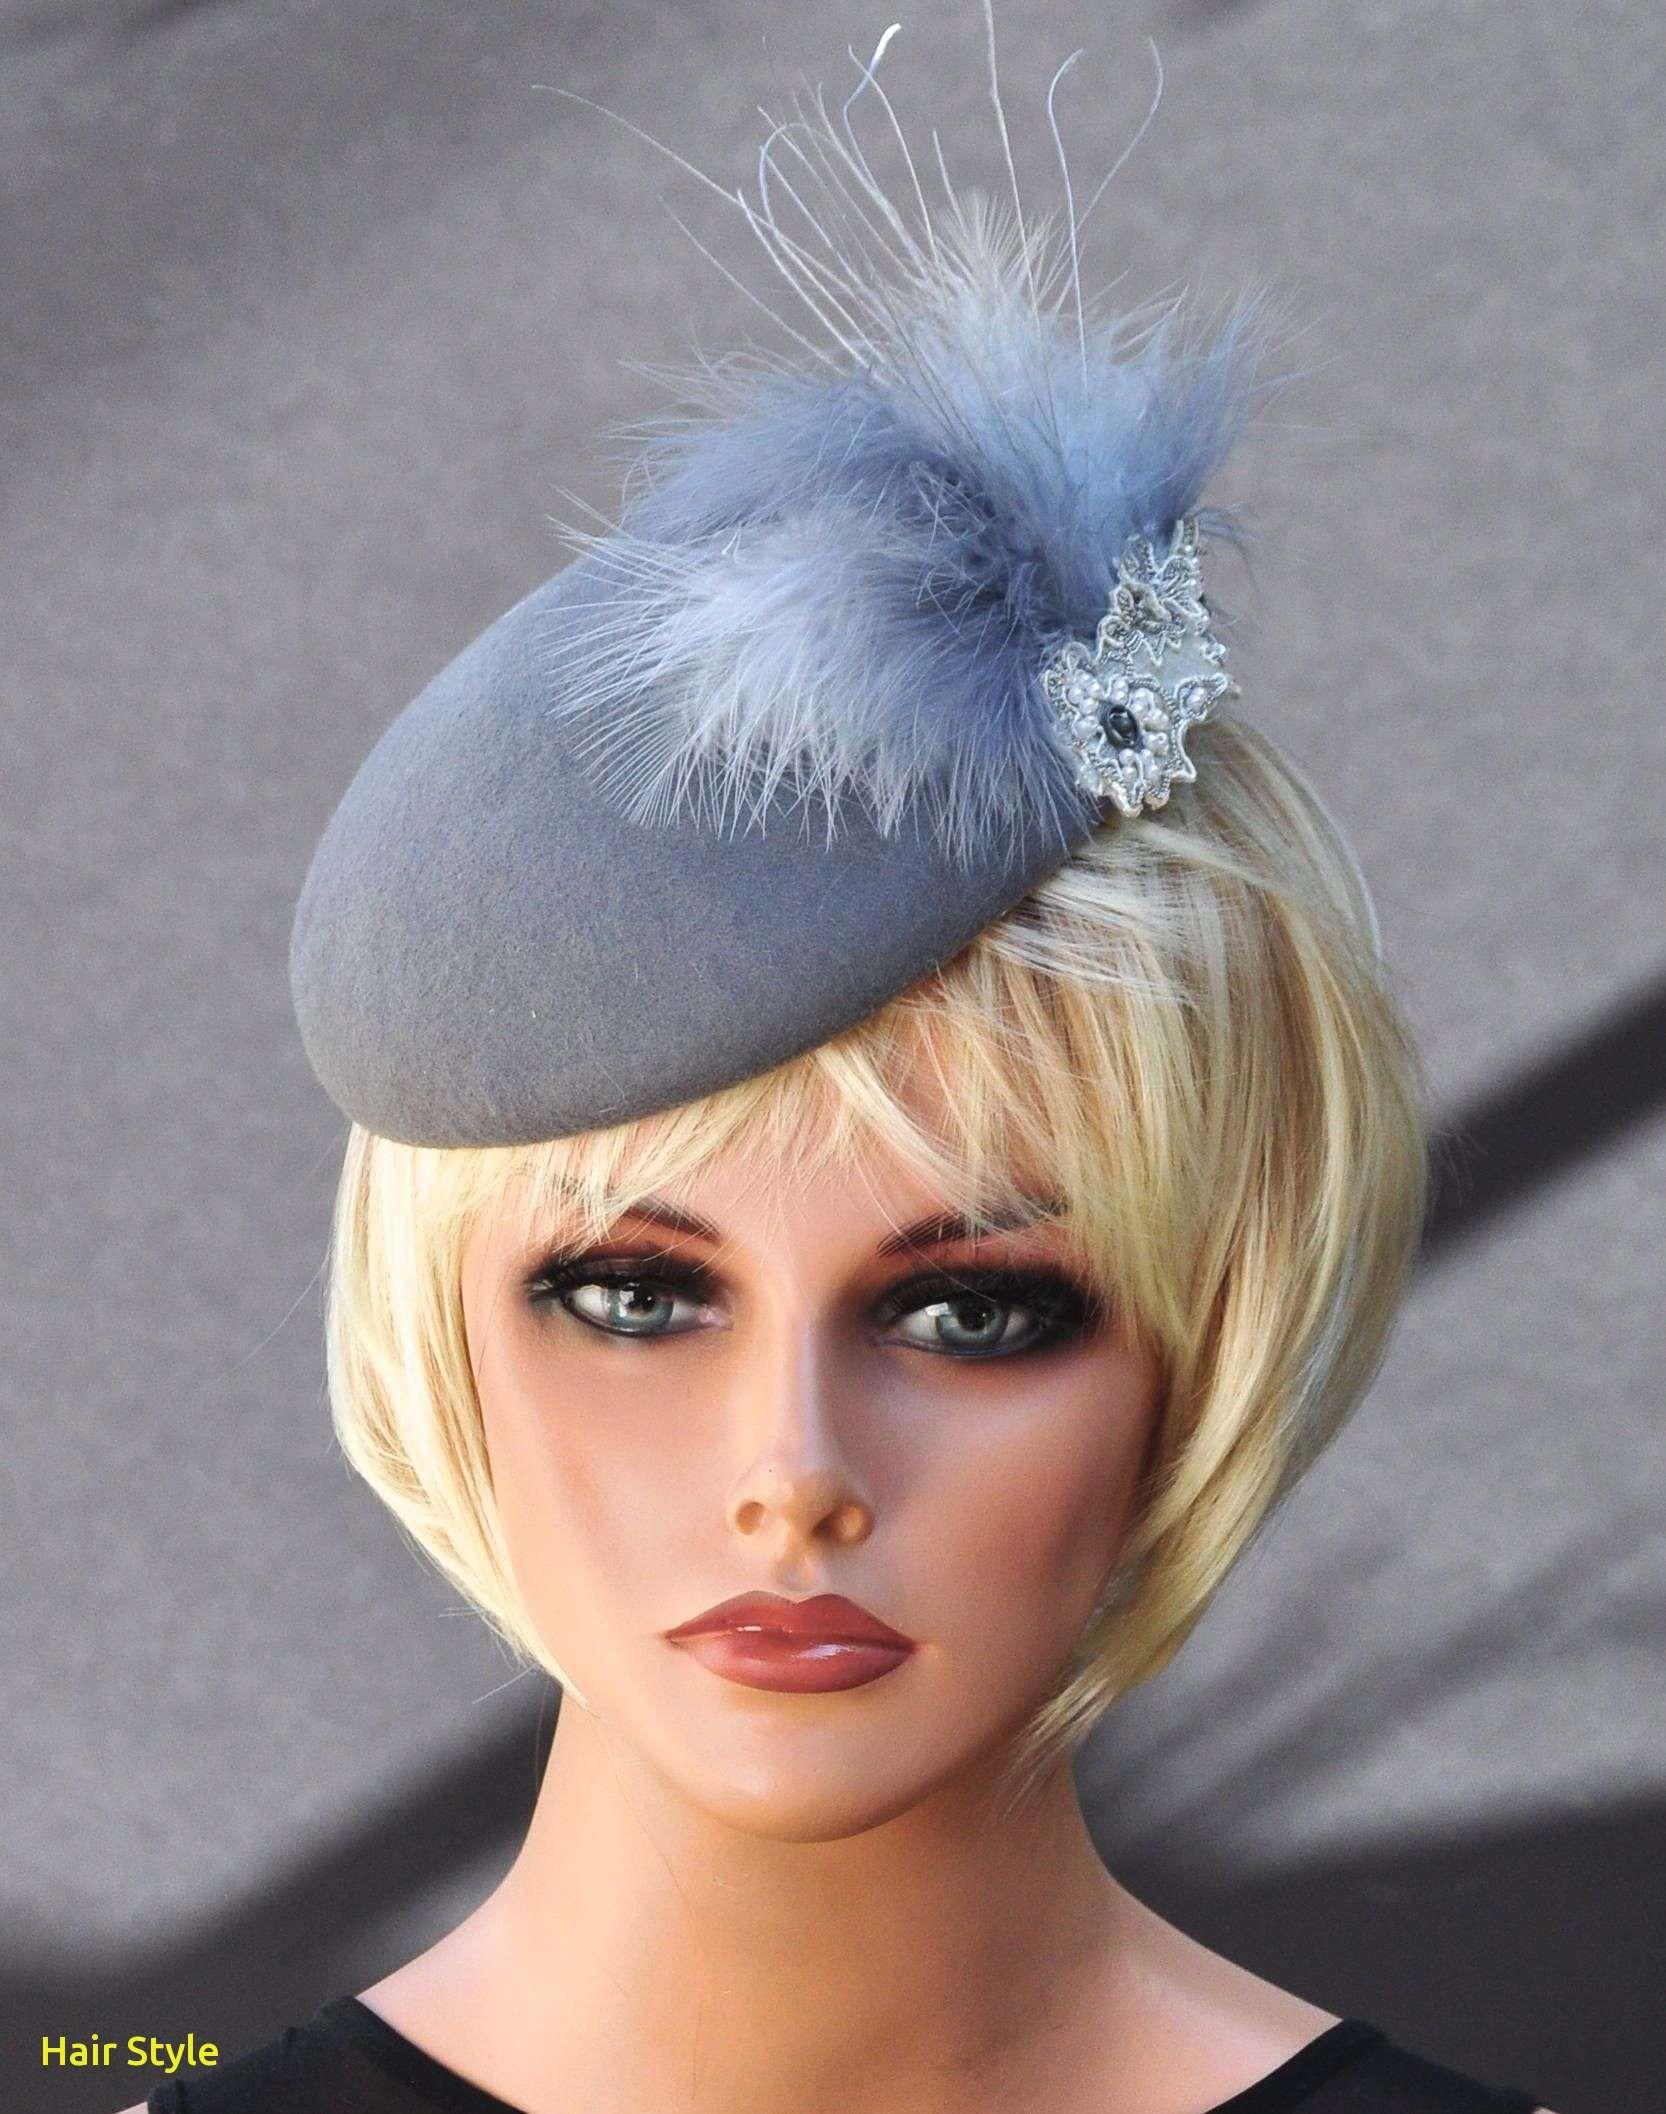 Neue Haar Fascinators für Hochzeiten Hats Chapeaux